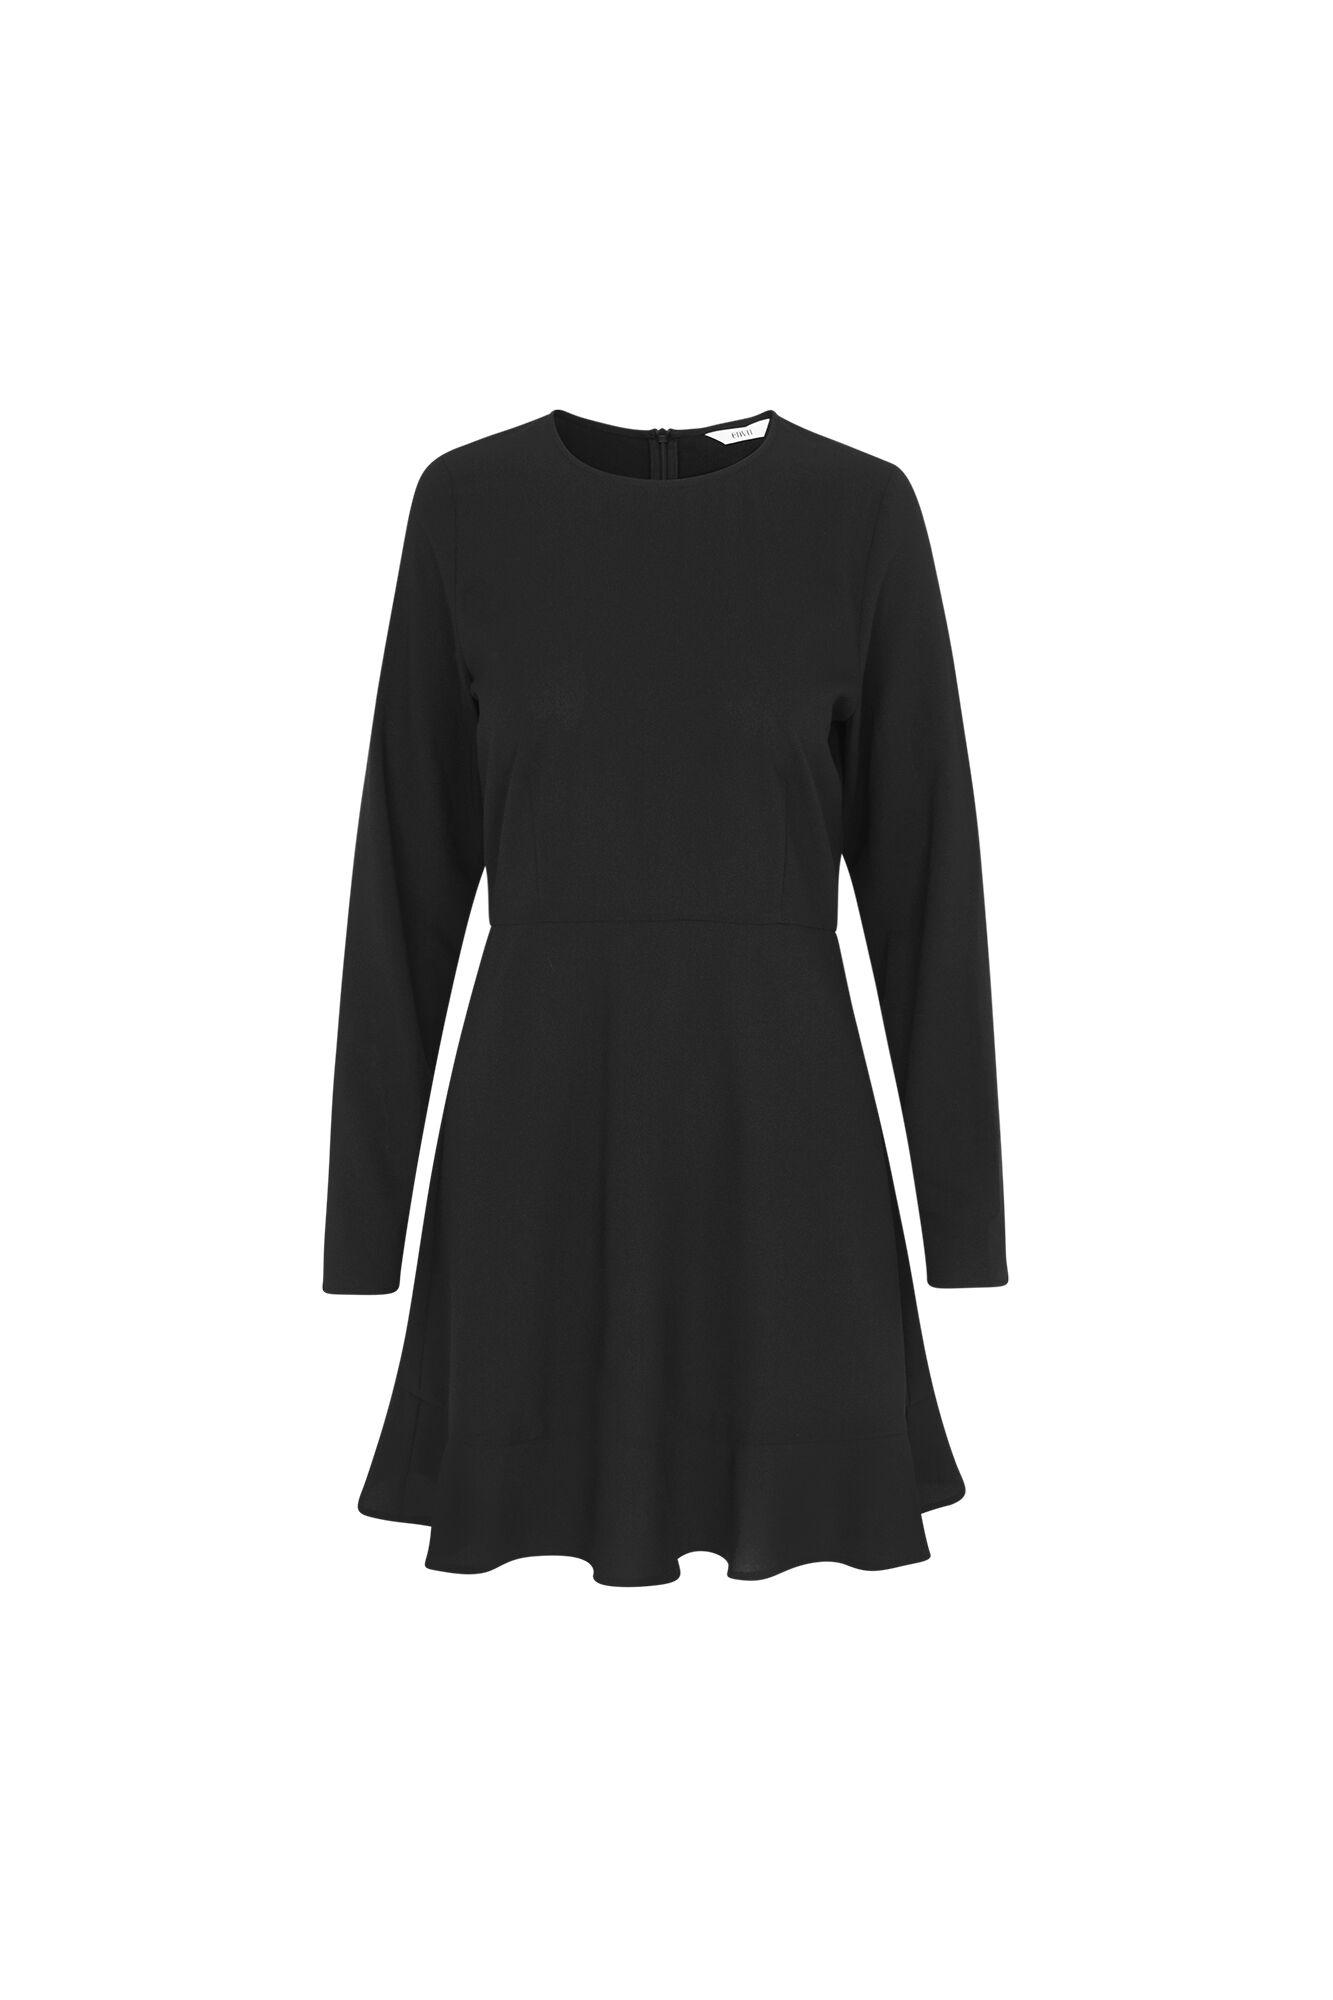 ENRODIN LS O-N DRESS 6444